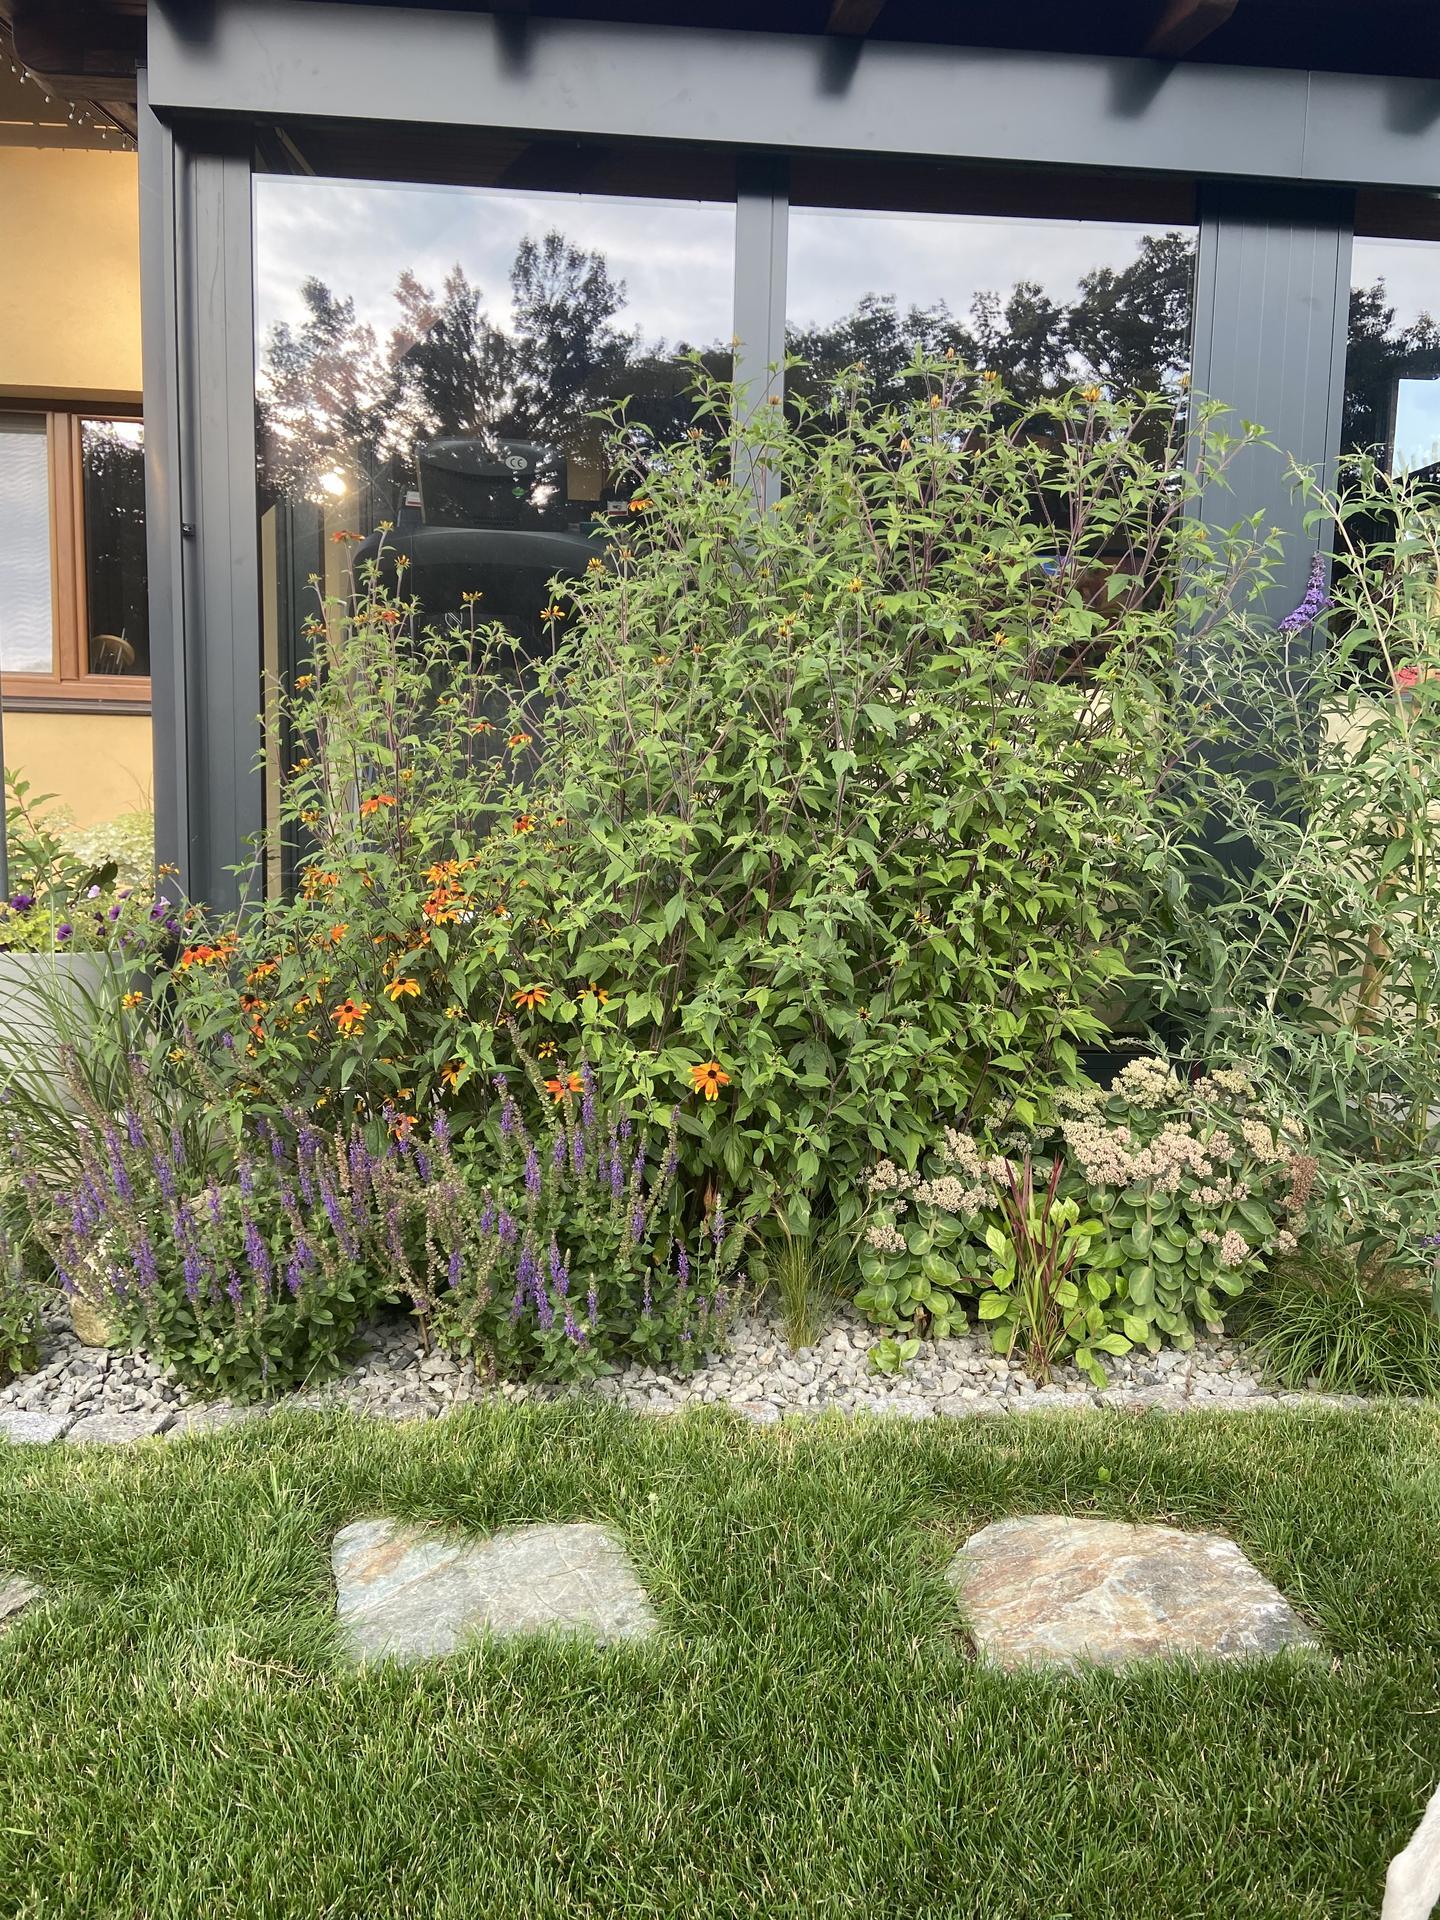 Pergola + zimní zahrada + zahrada - Echinacea je skoro dvoumetrova